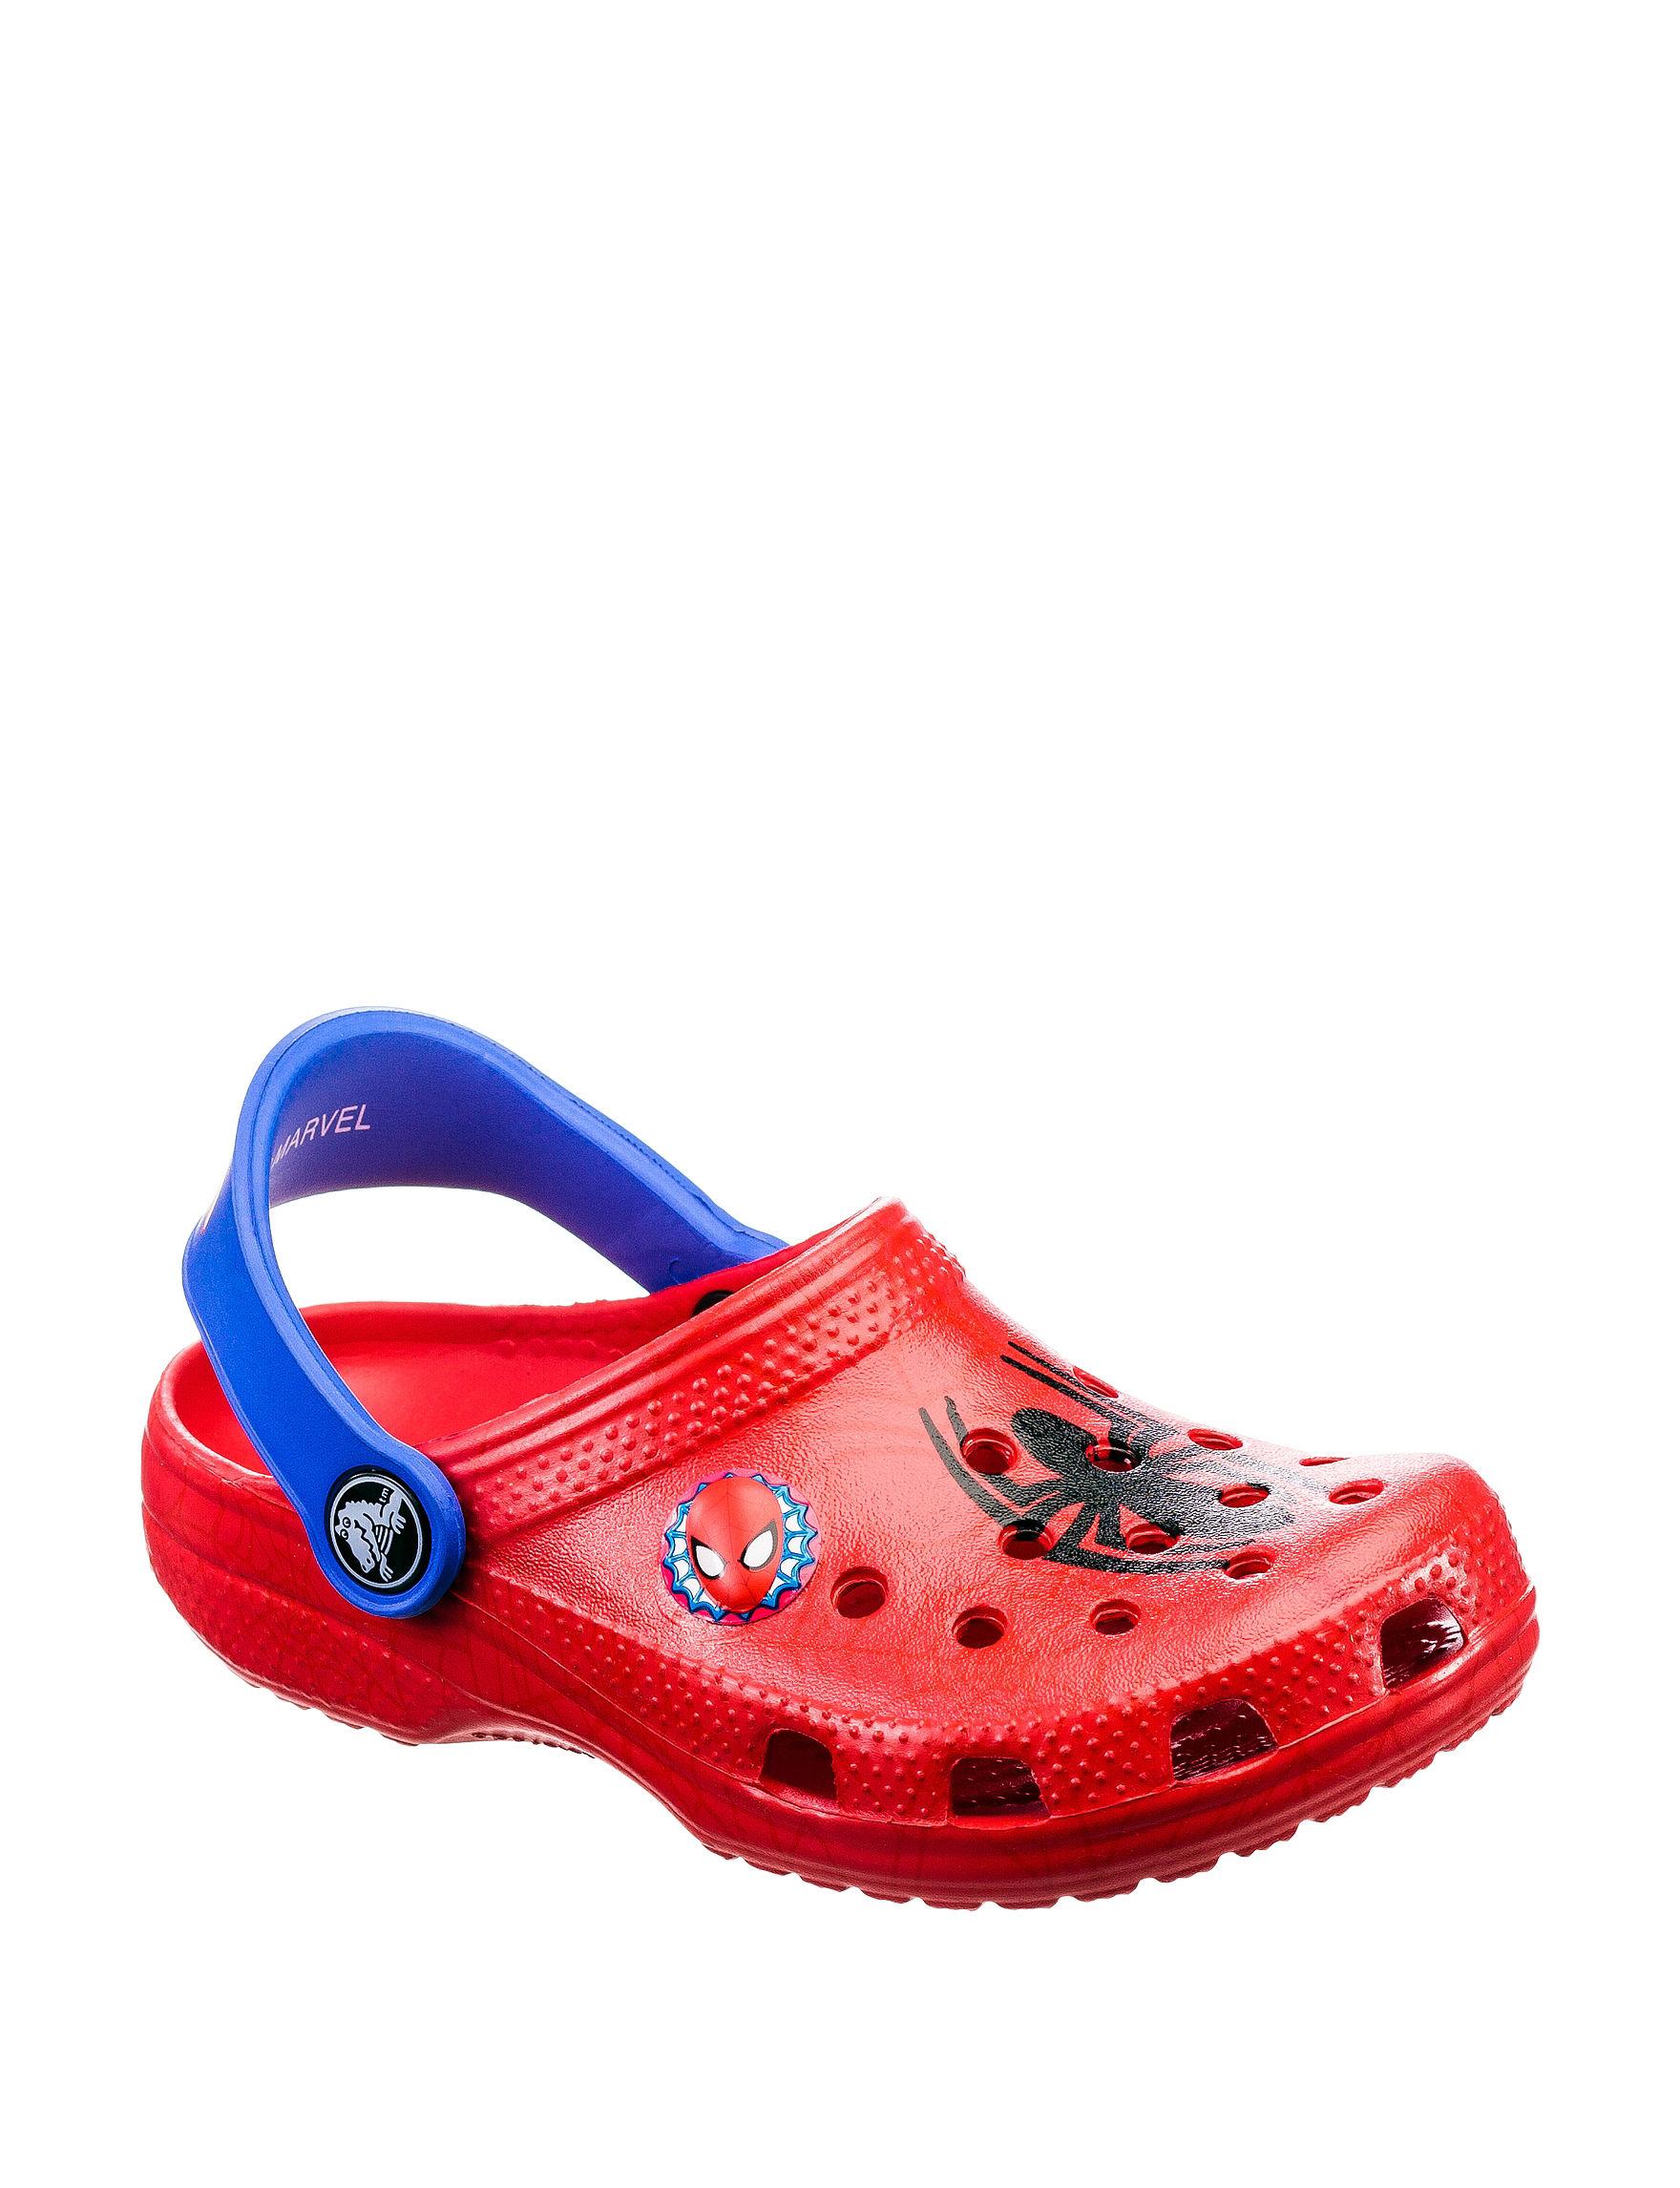 Crocs Red